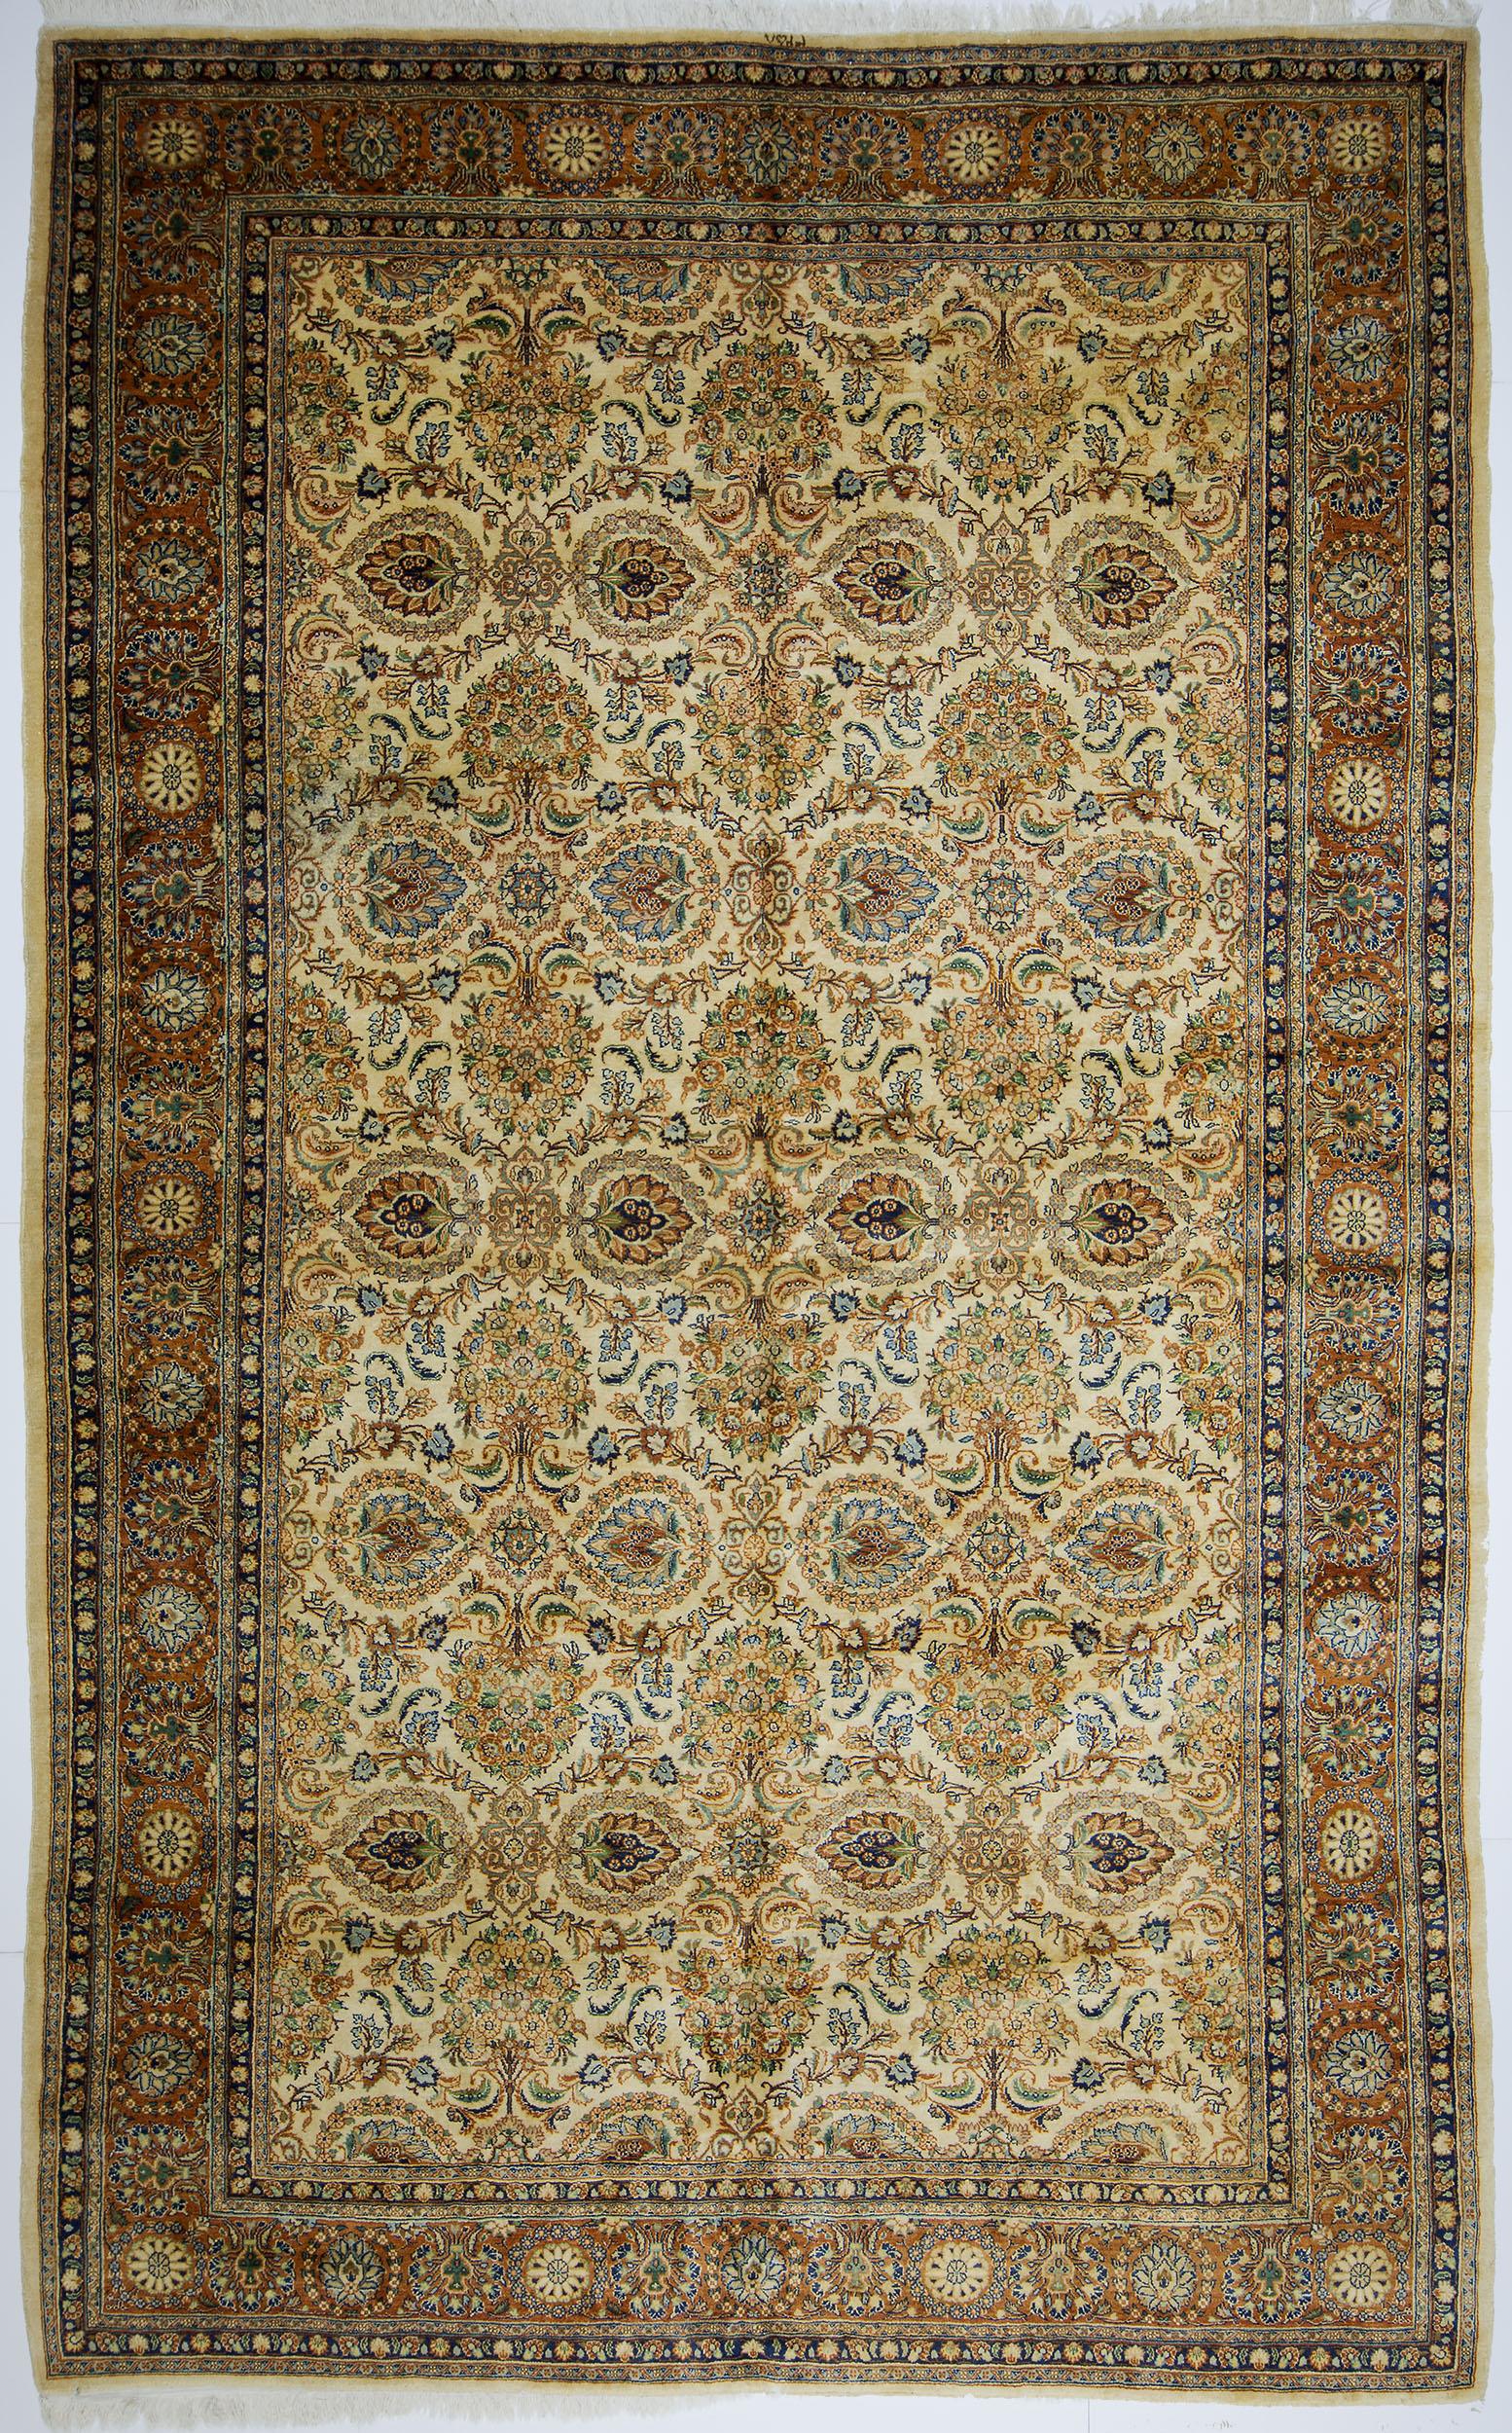 "Qazvin Carpet 15' 11"" x 9' 9"""